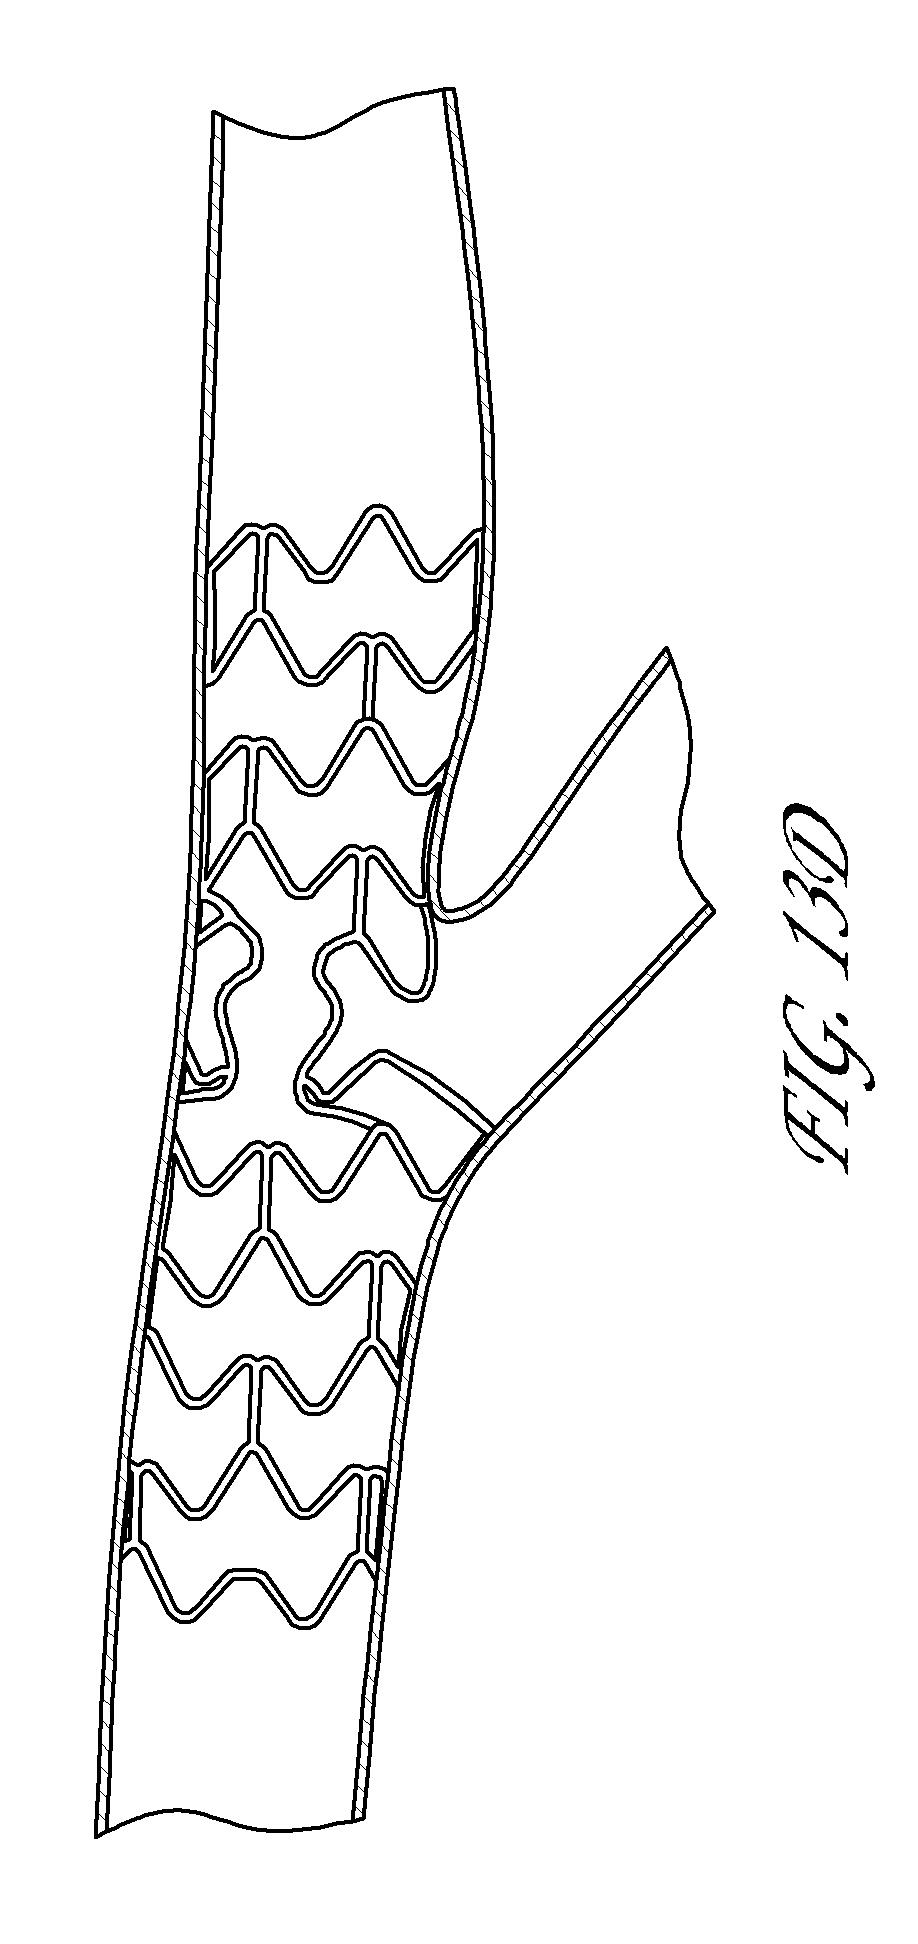 catheter prothesis Wwwgooglecombr.